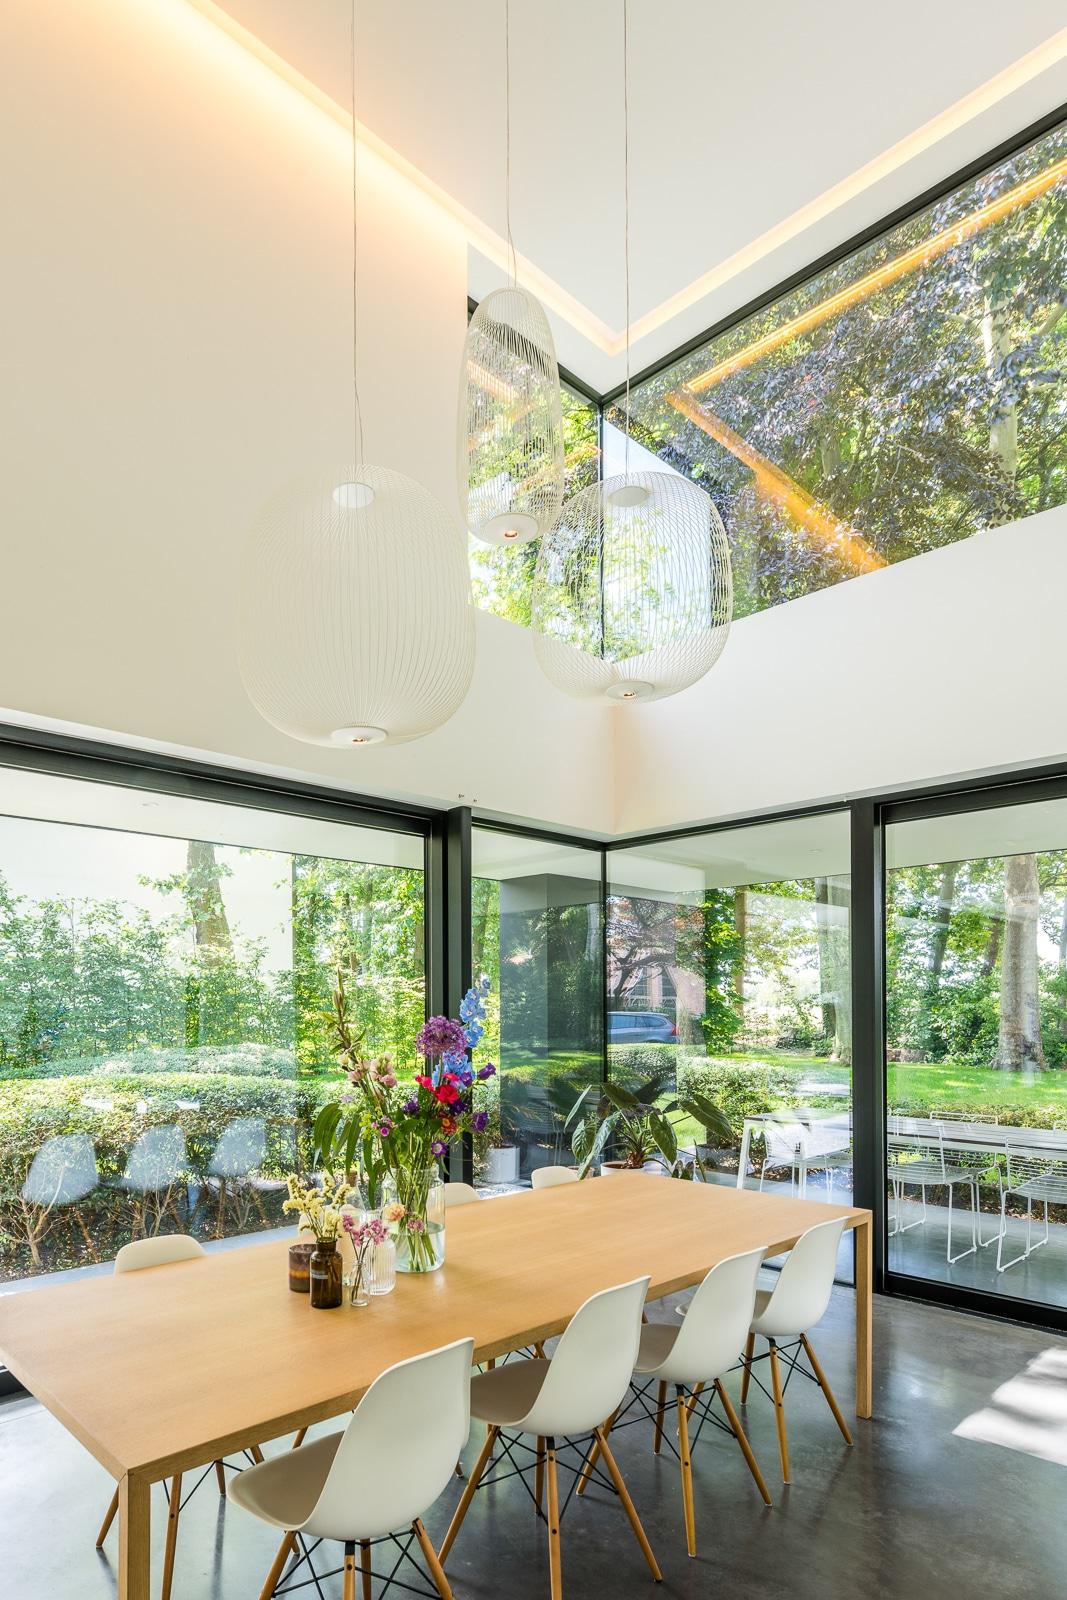 BaeyensBeck Kjell 029web | Baeyens & Beck architecten Gent | architect nieuwbouw renovatie interieur | high end | architectenbureau